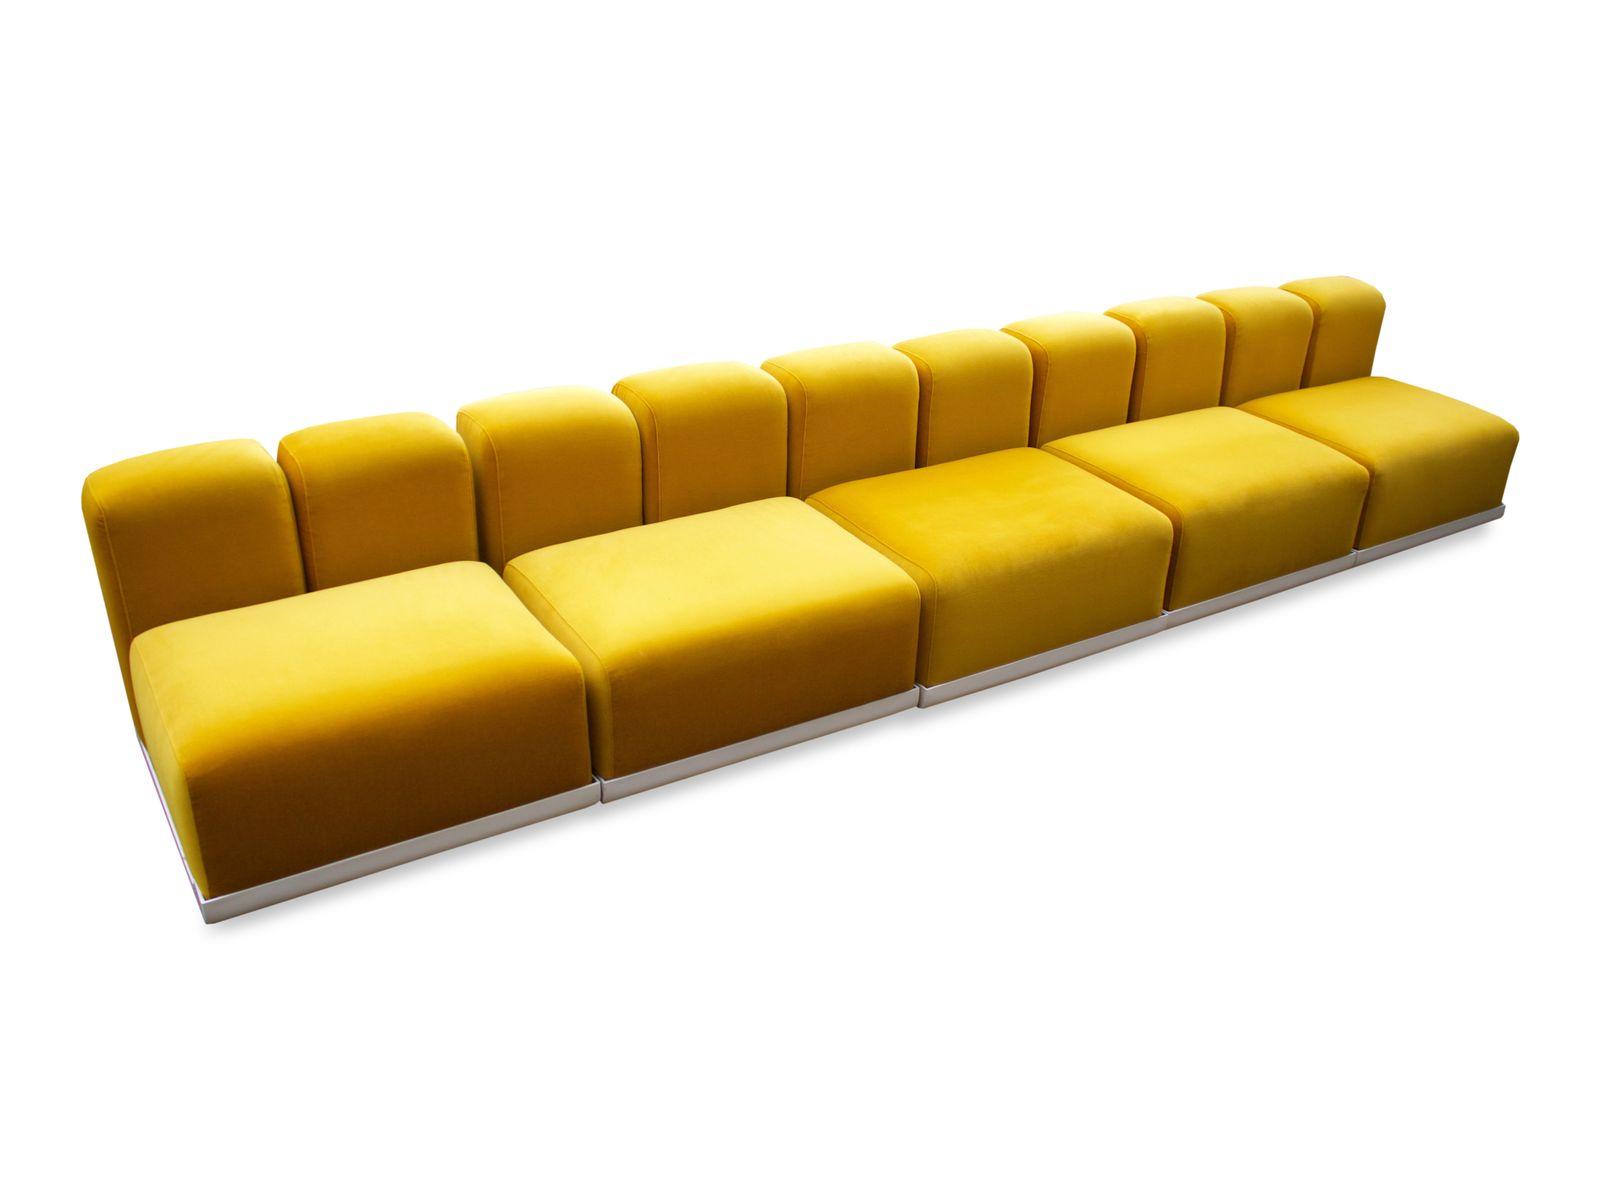 Raymond Sectional Sofa by Kazuhide Takahama for Gavina